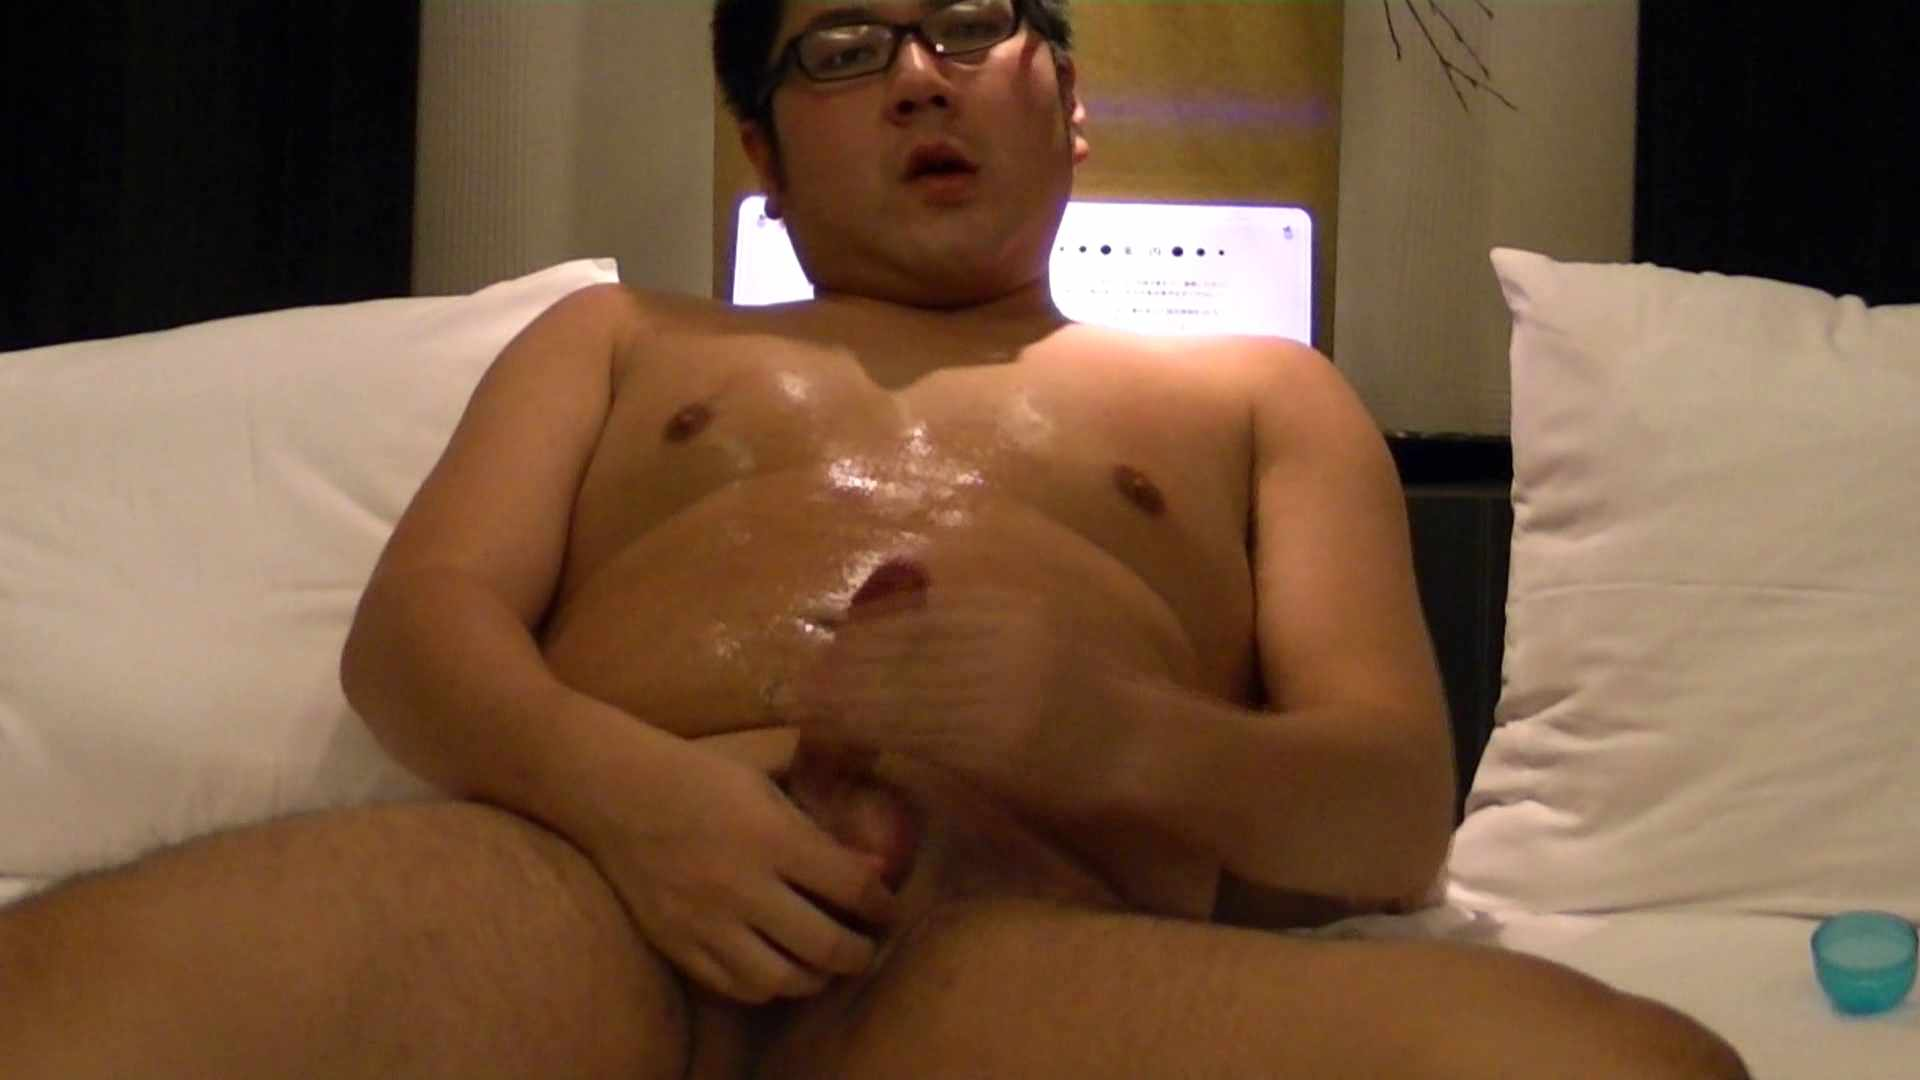 Mr.オナックスさん投稿!HD 貴方のオナニー三万円で撮影させてください。VOL.03 後編 完全無修正でお届け | オナニー特集  83pic 47